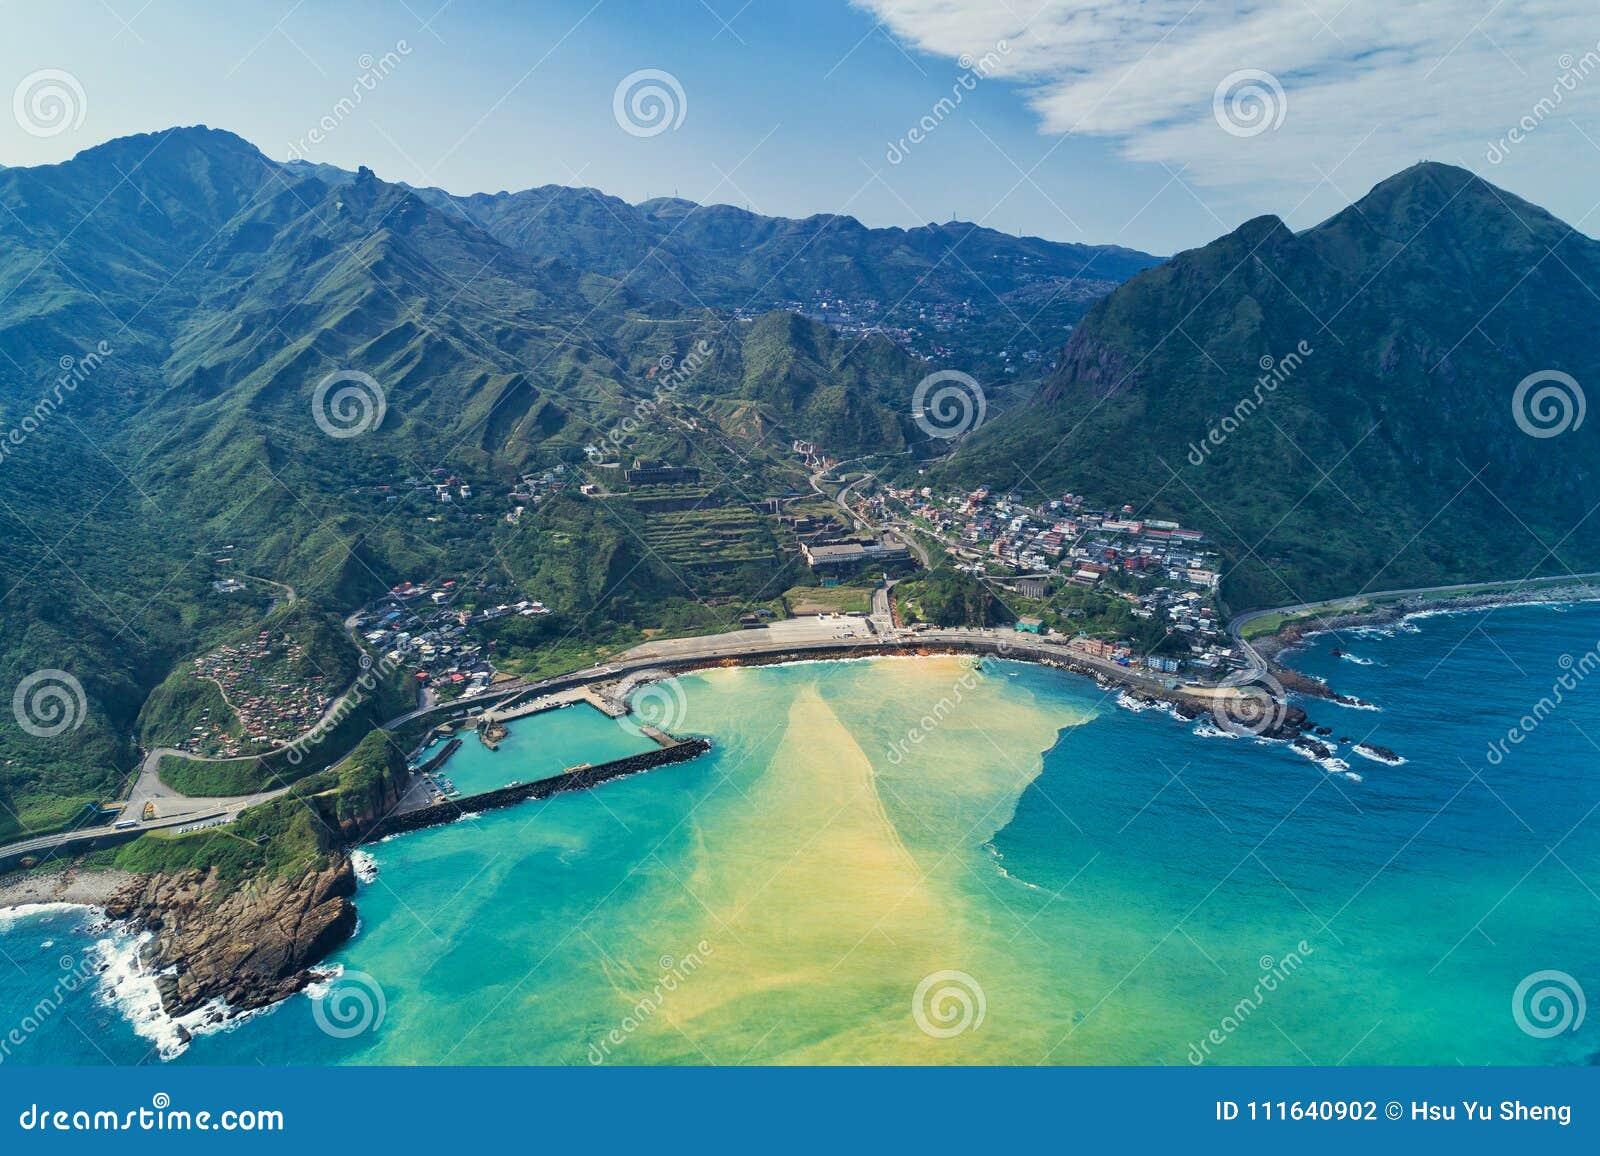 Yinyang Sea Aerial View - Famous travel destinations of Taiwan, panoramic bird's eye view.